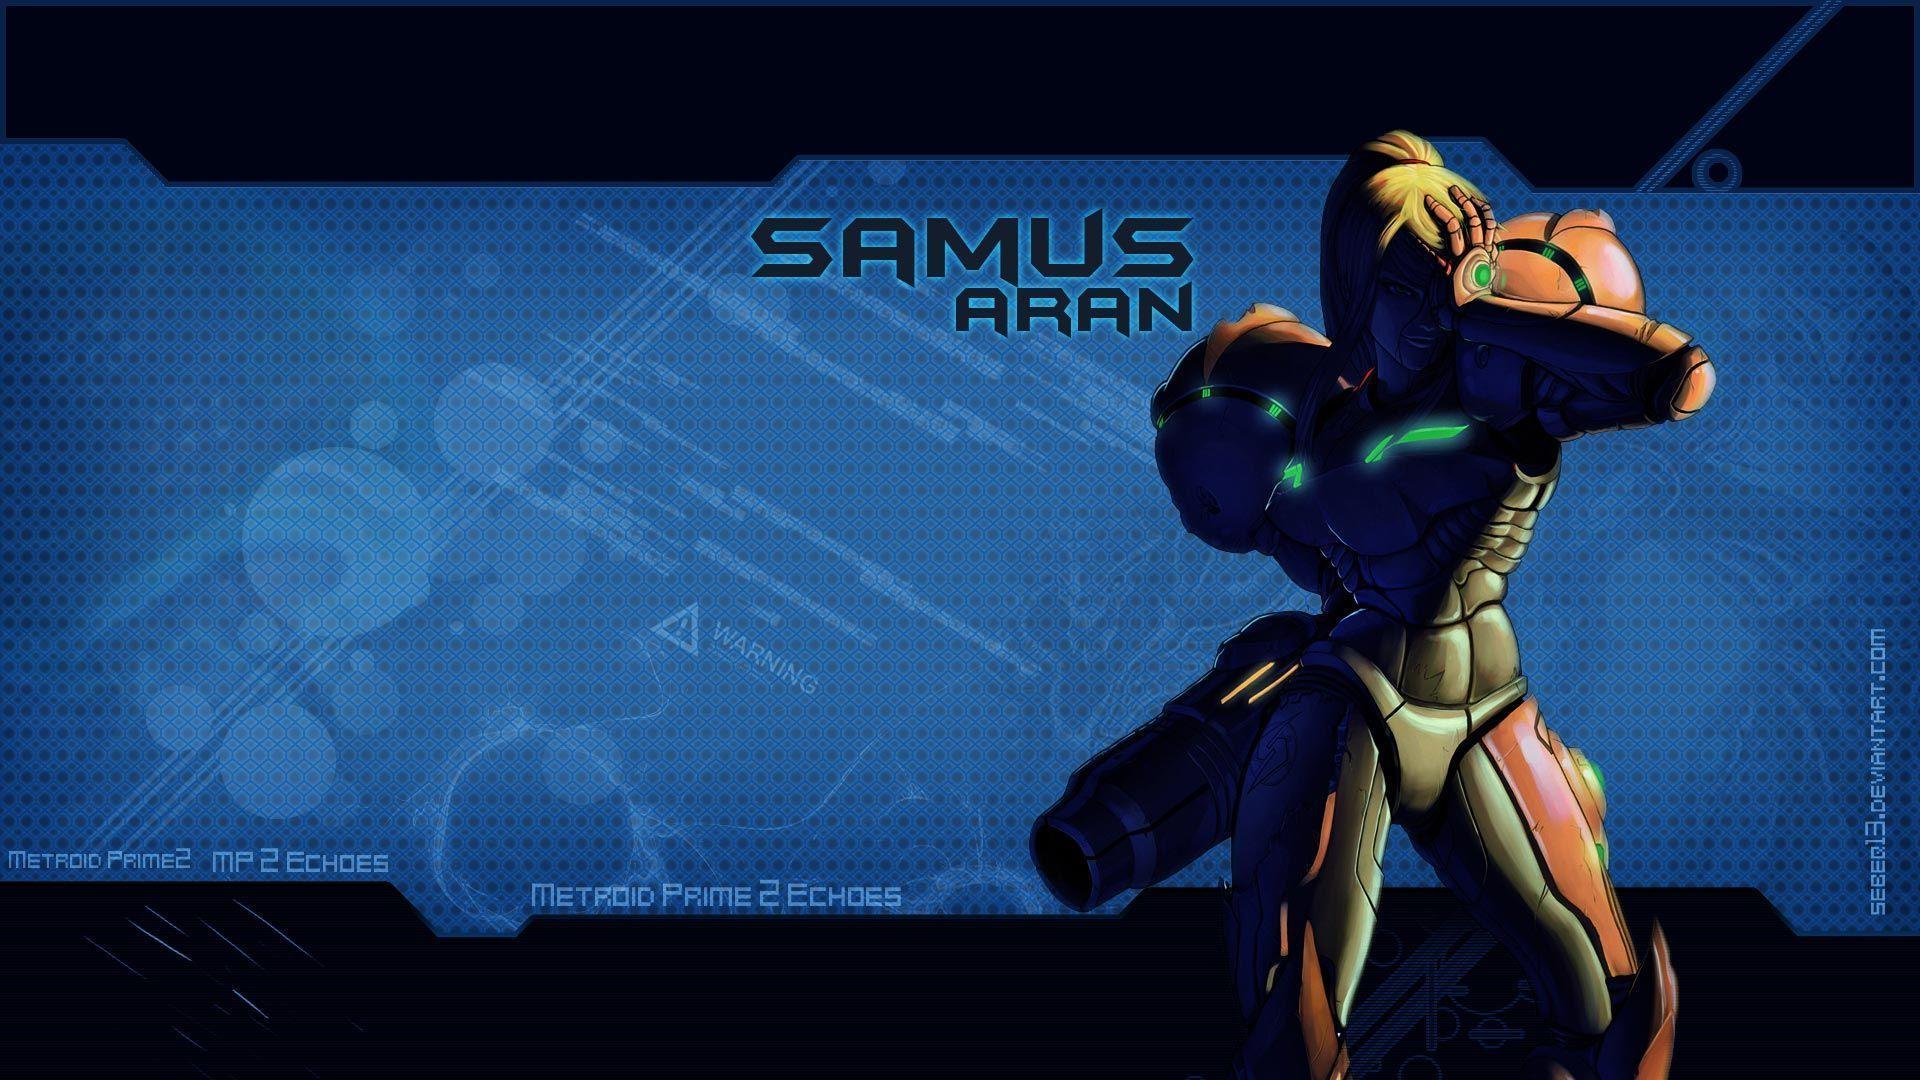 samus metroid prime wallpaper - photo #31